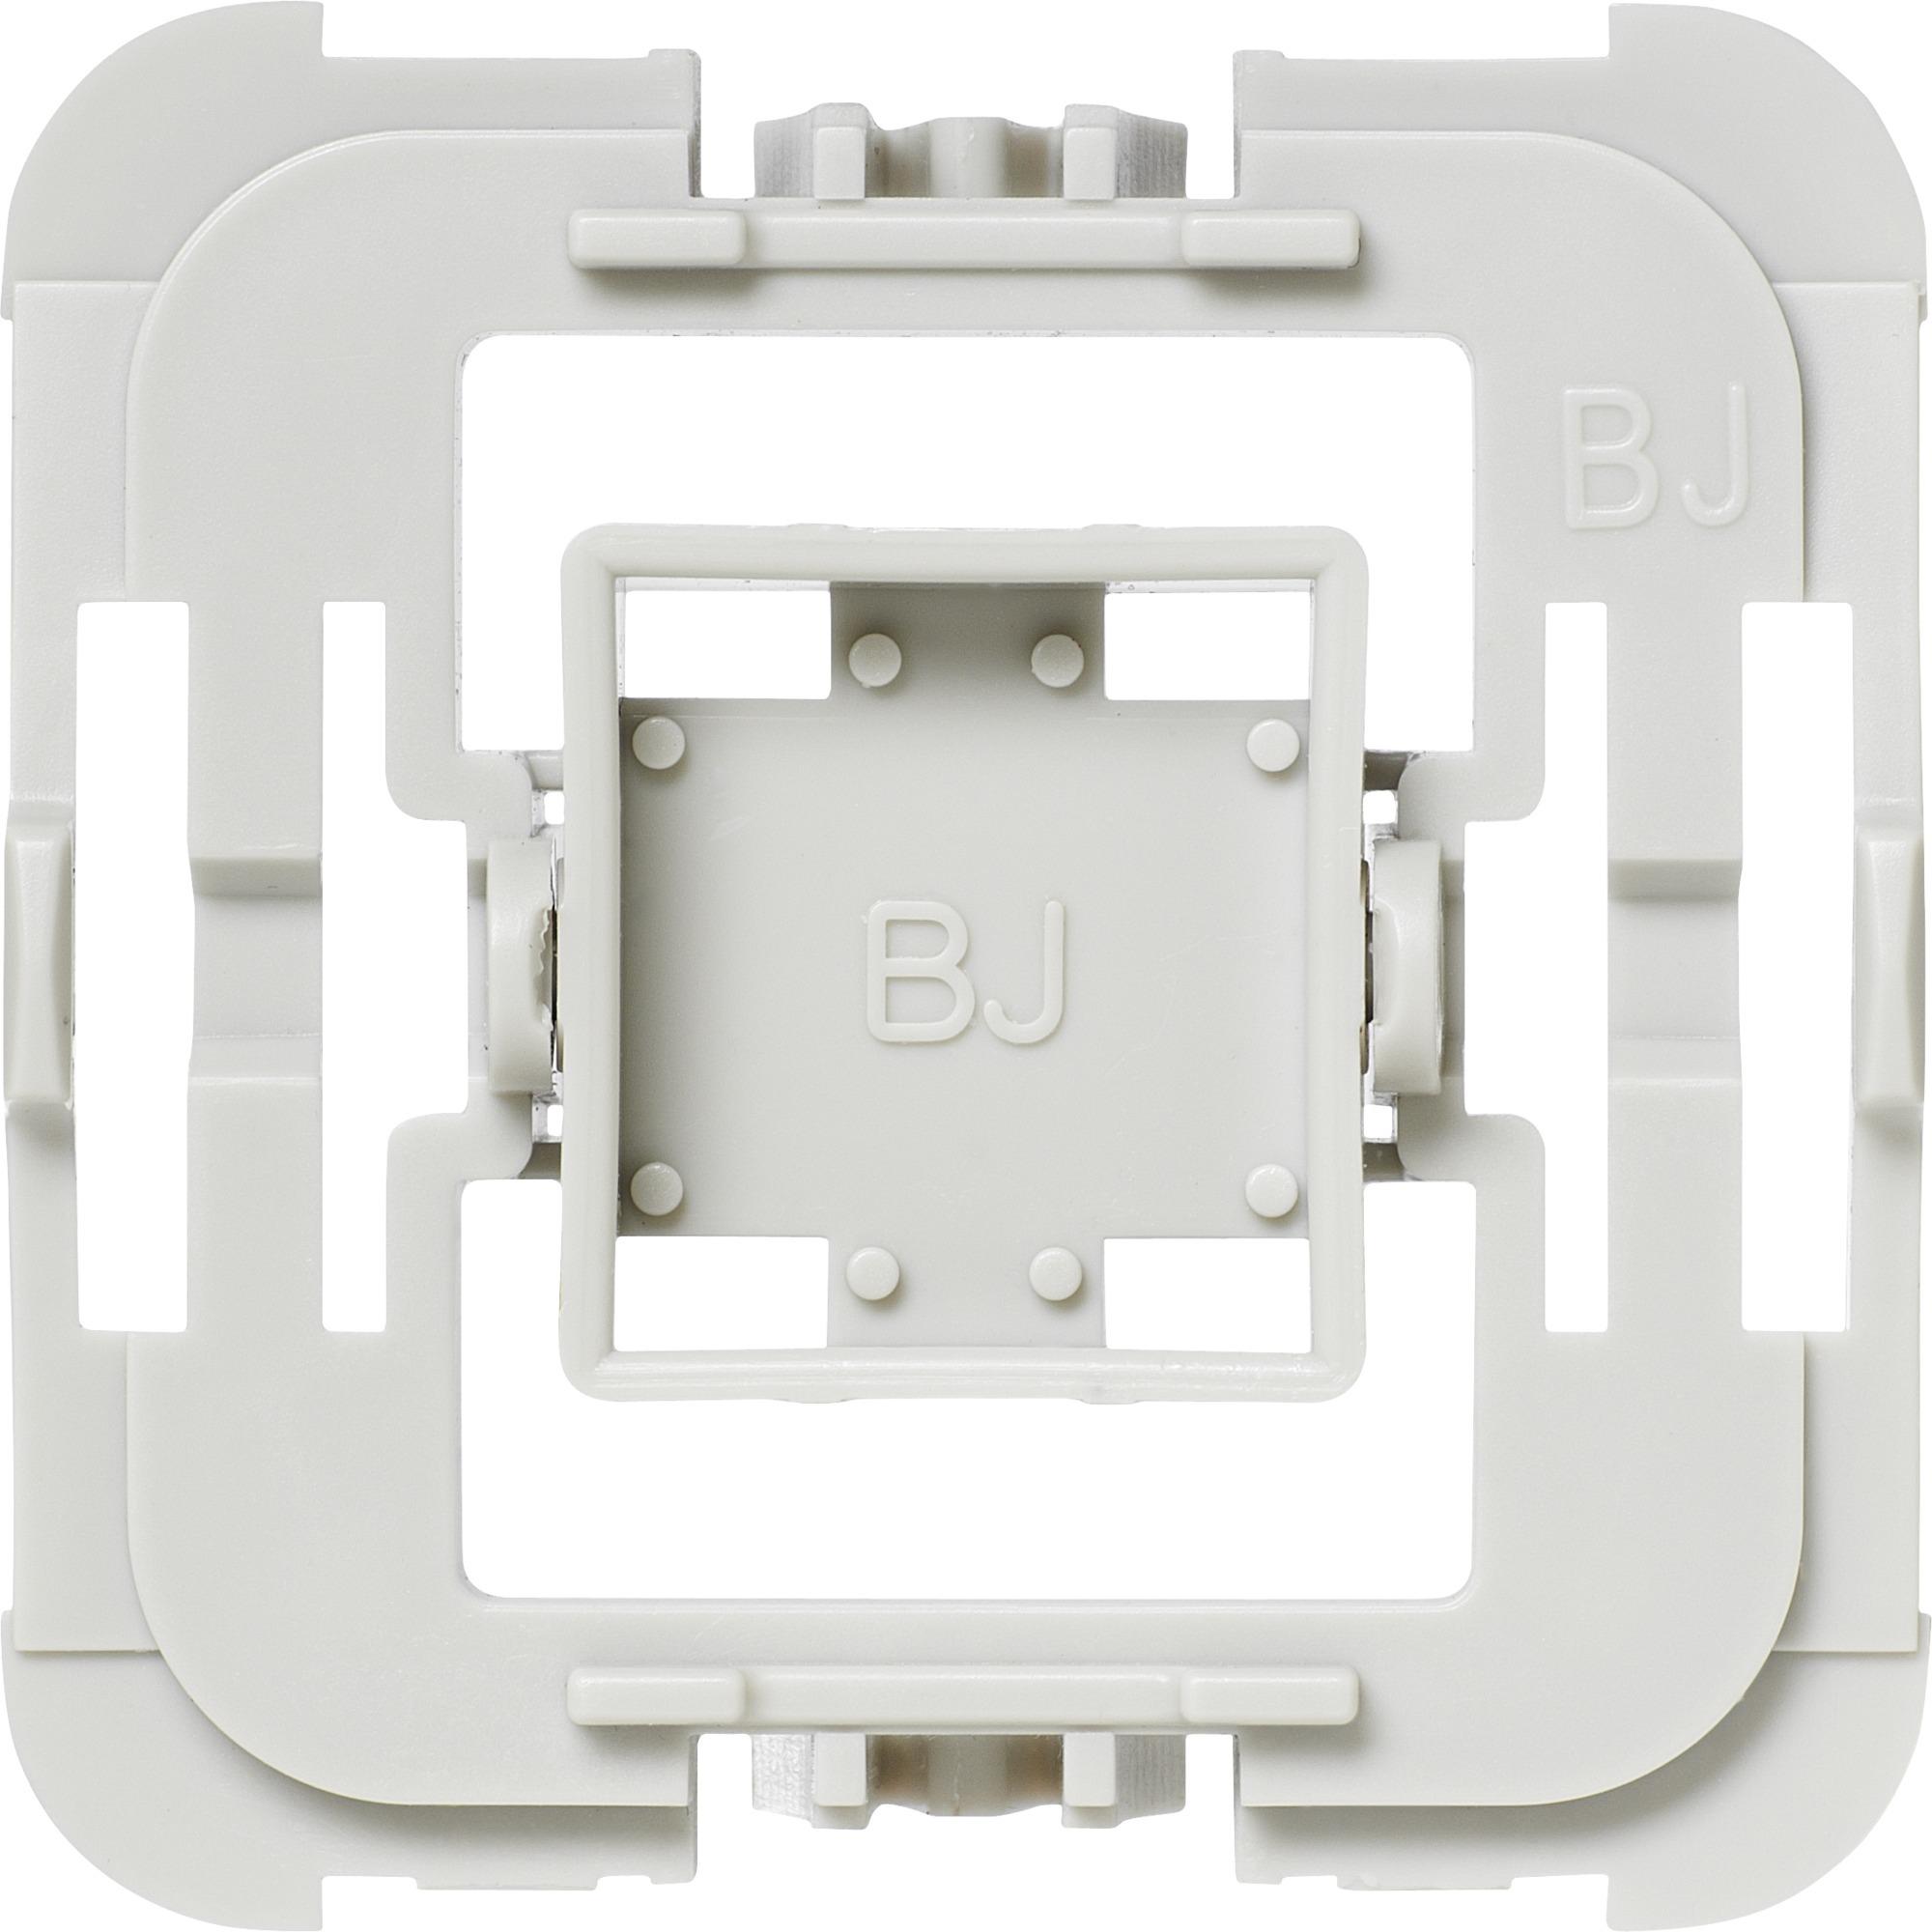 EQ3-ADA-BJ Atenuador e interruptor Integrado Blanco, Adaptador